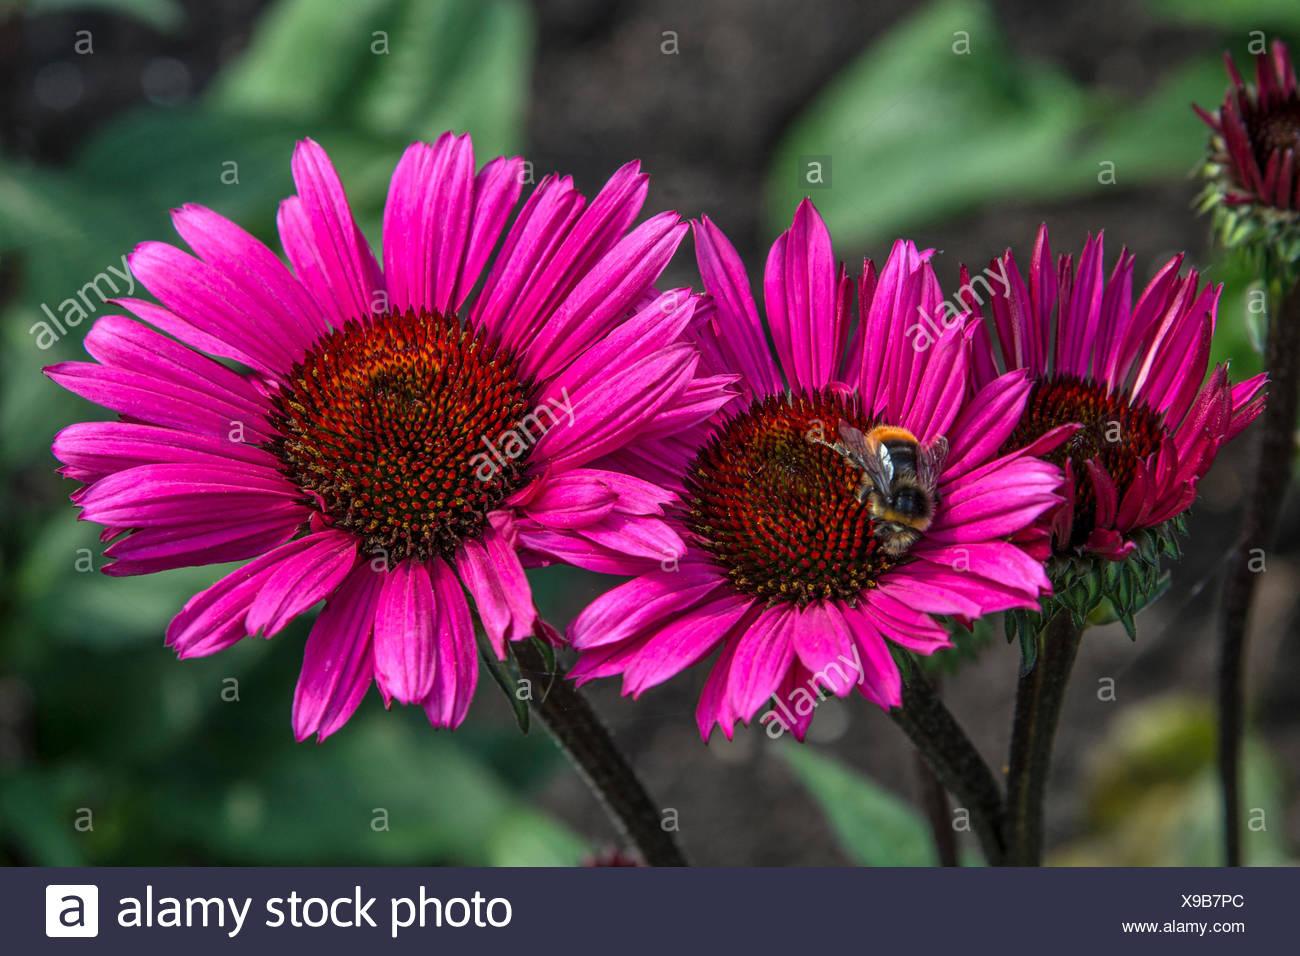 echinacea purpurea fatal attraction stock photos. Black Bedroom Furniture Sets. Home Design Ideas